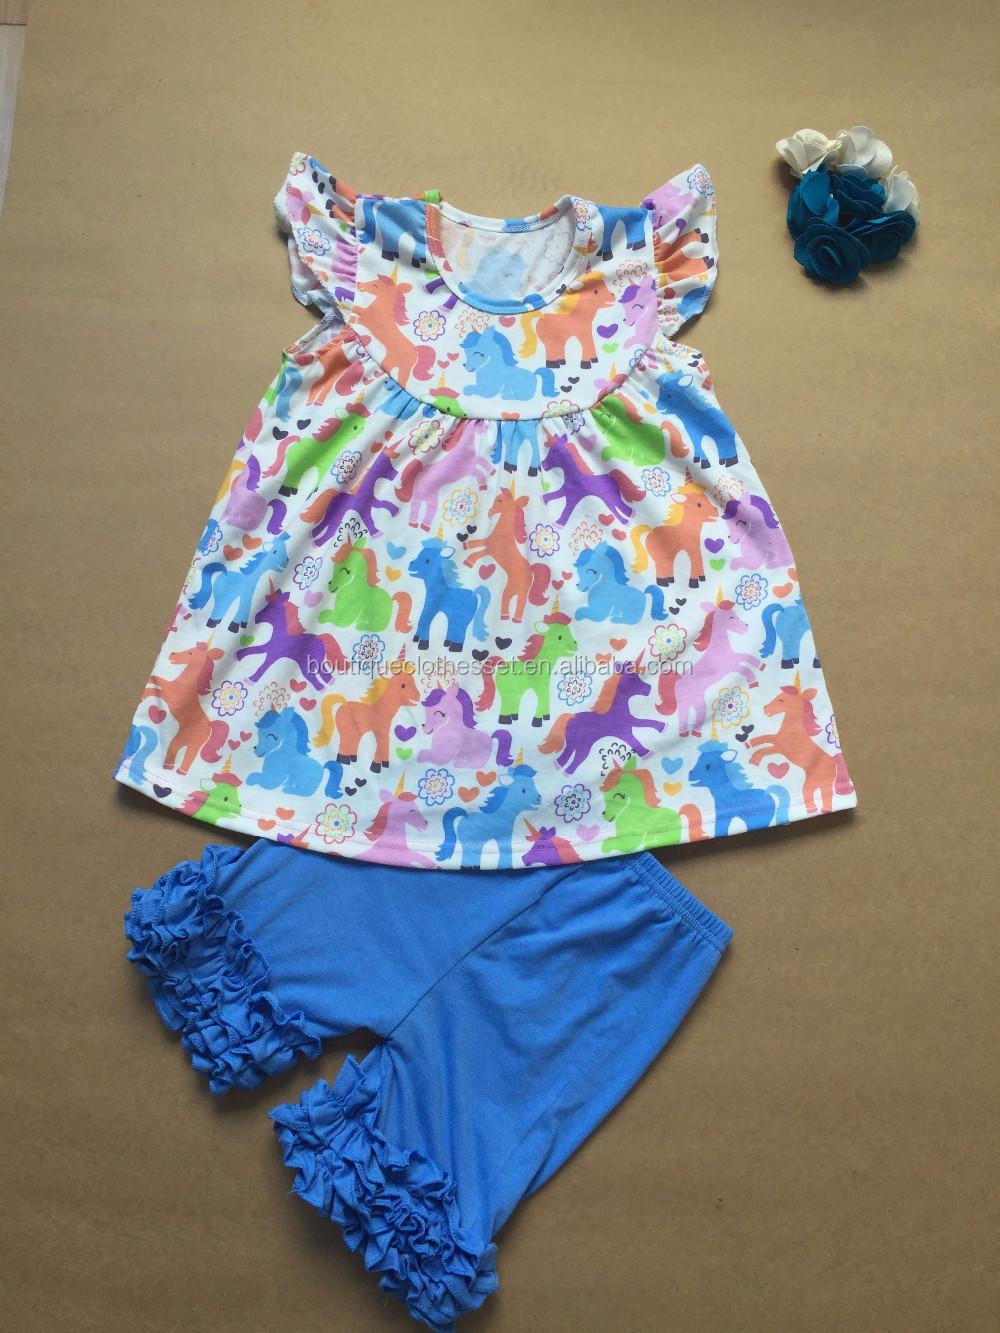 children boutique sets fashion clothing 2016 unicorn outfit wholesale  clothing manufacturers 175b2953ba